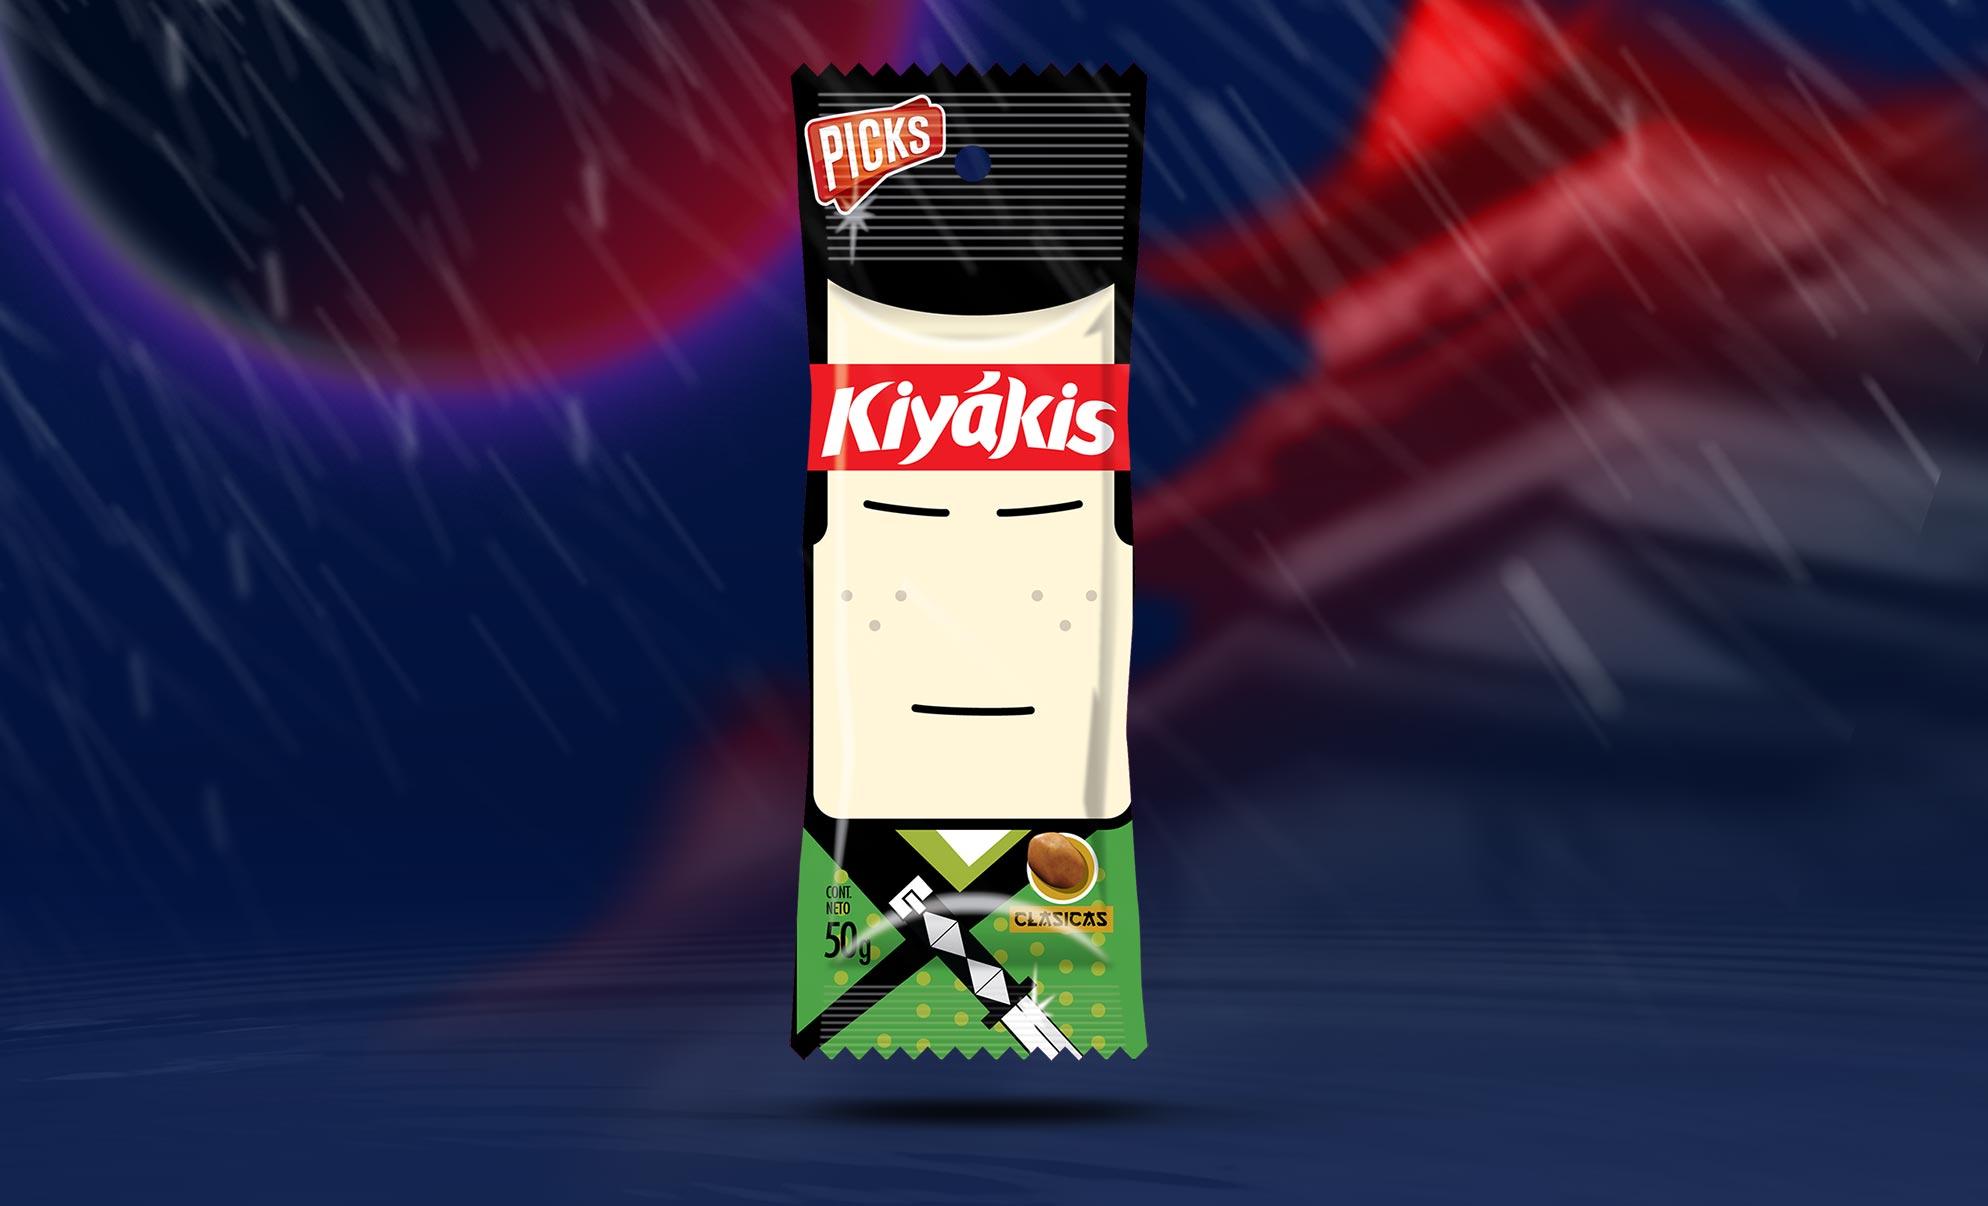 Kiyakis Peanuts Packaging Character Samurai